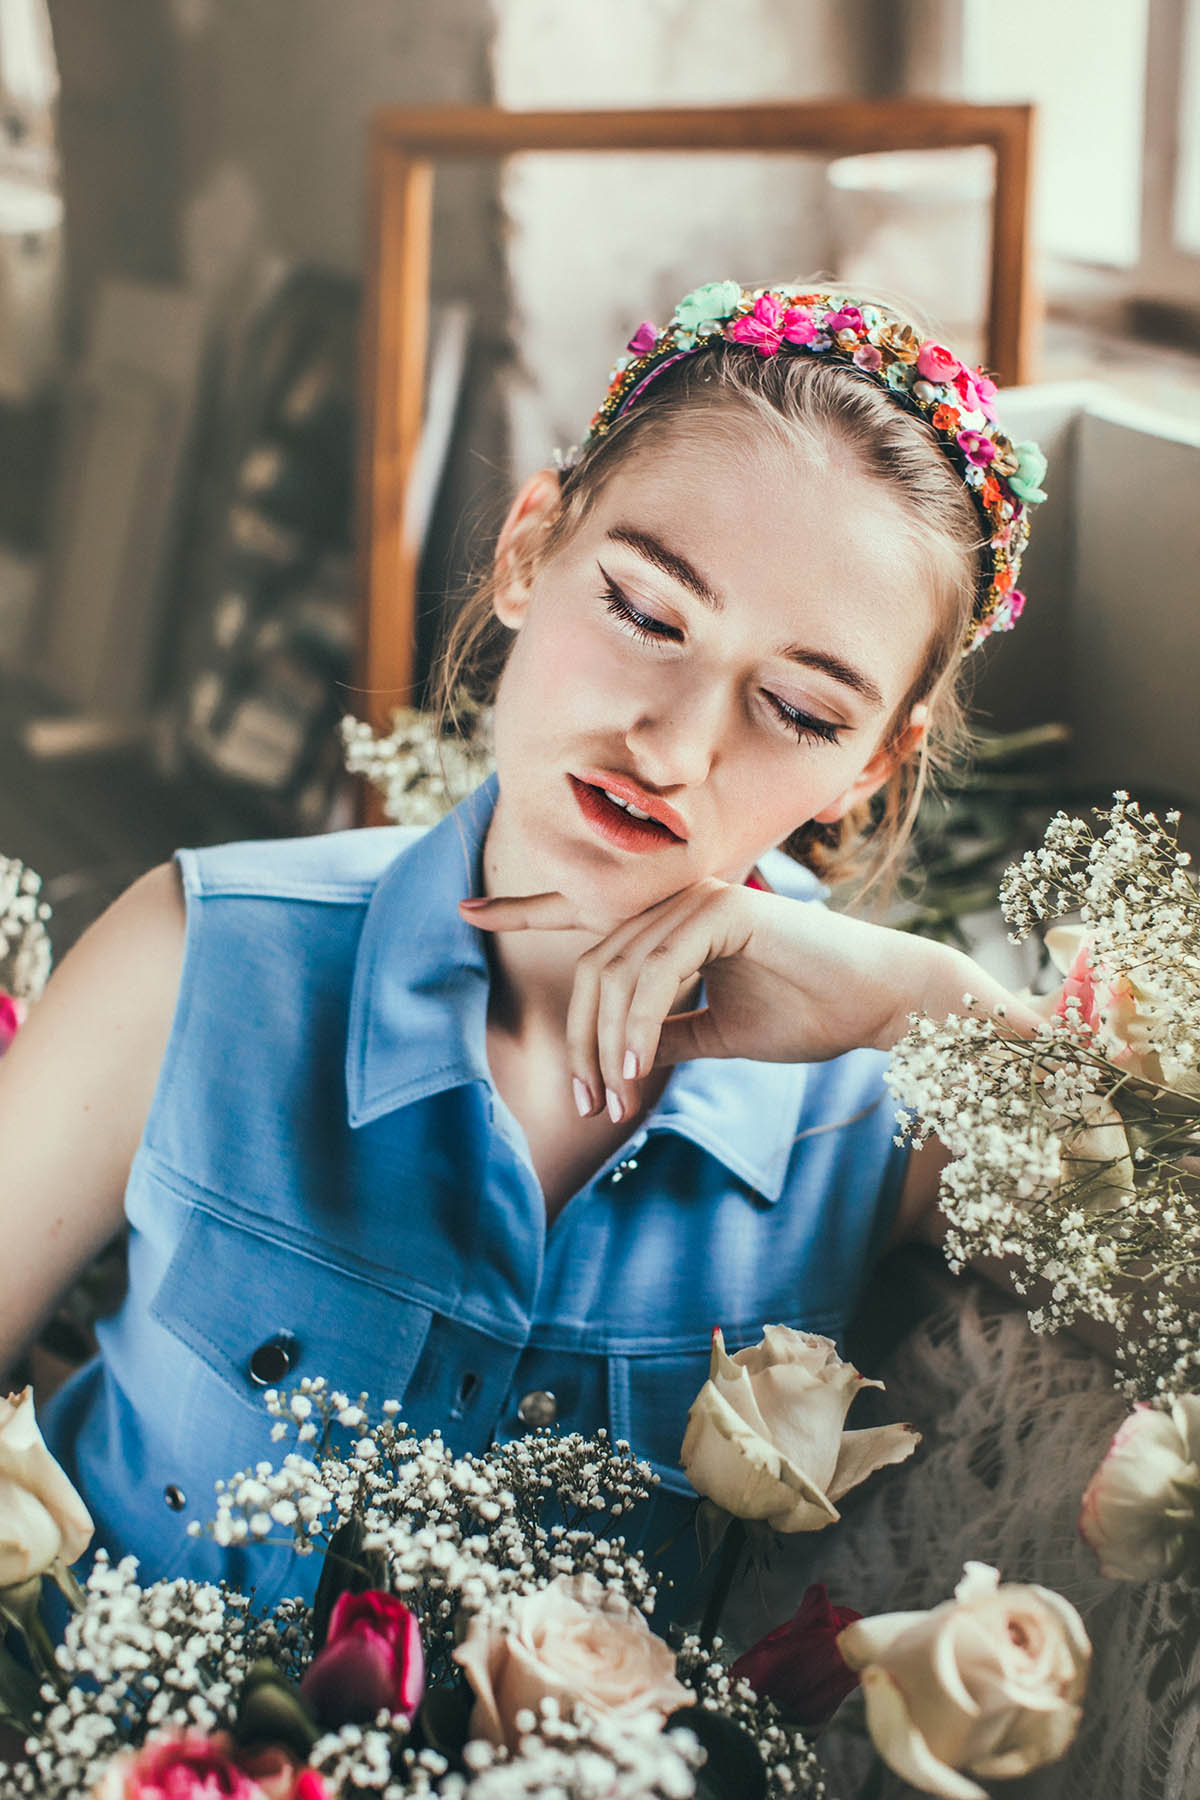 We-Are-Flowergirls_Lookbook_Flowercrown_Blumenkranz_SS17_c_Lupi-Spuma_Web_20.jpg